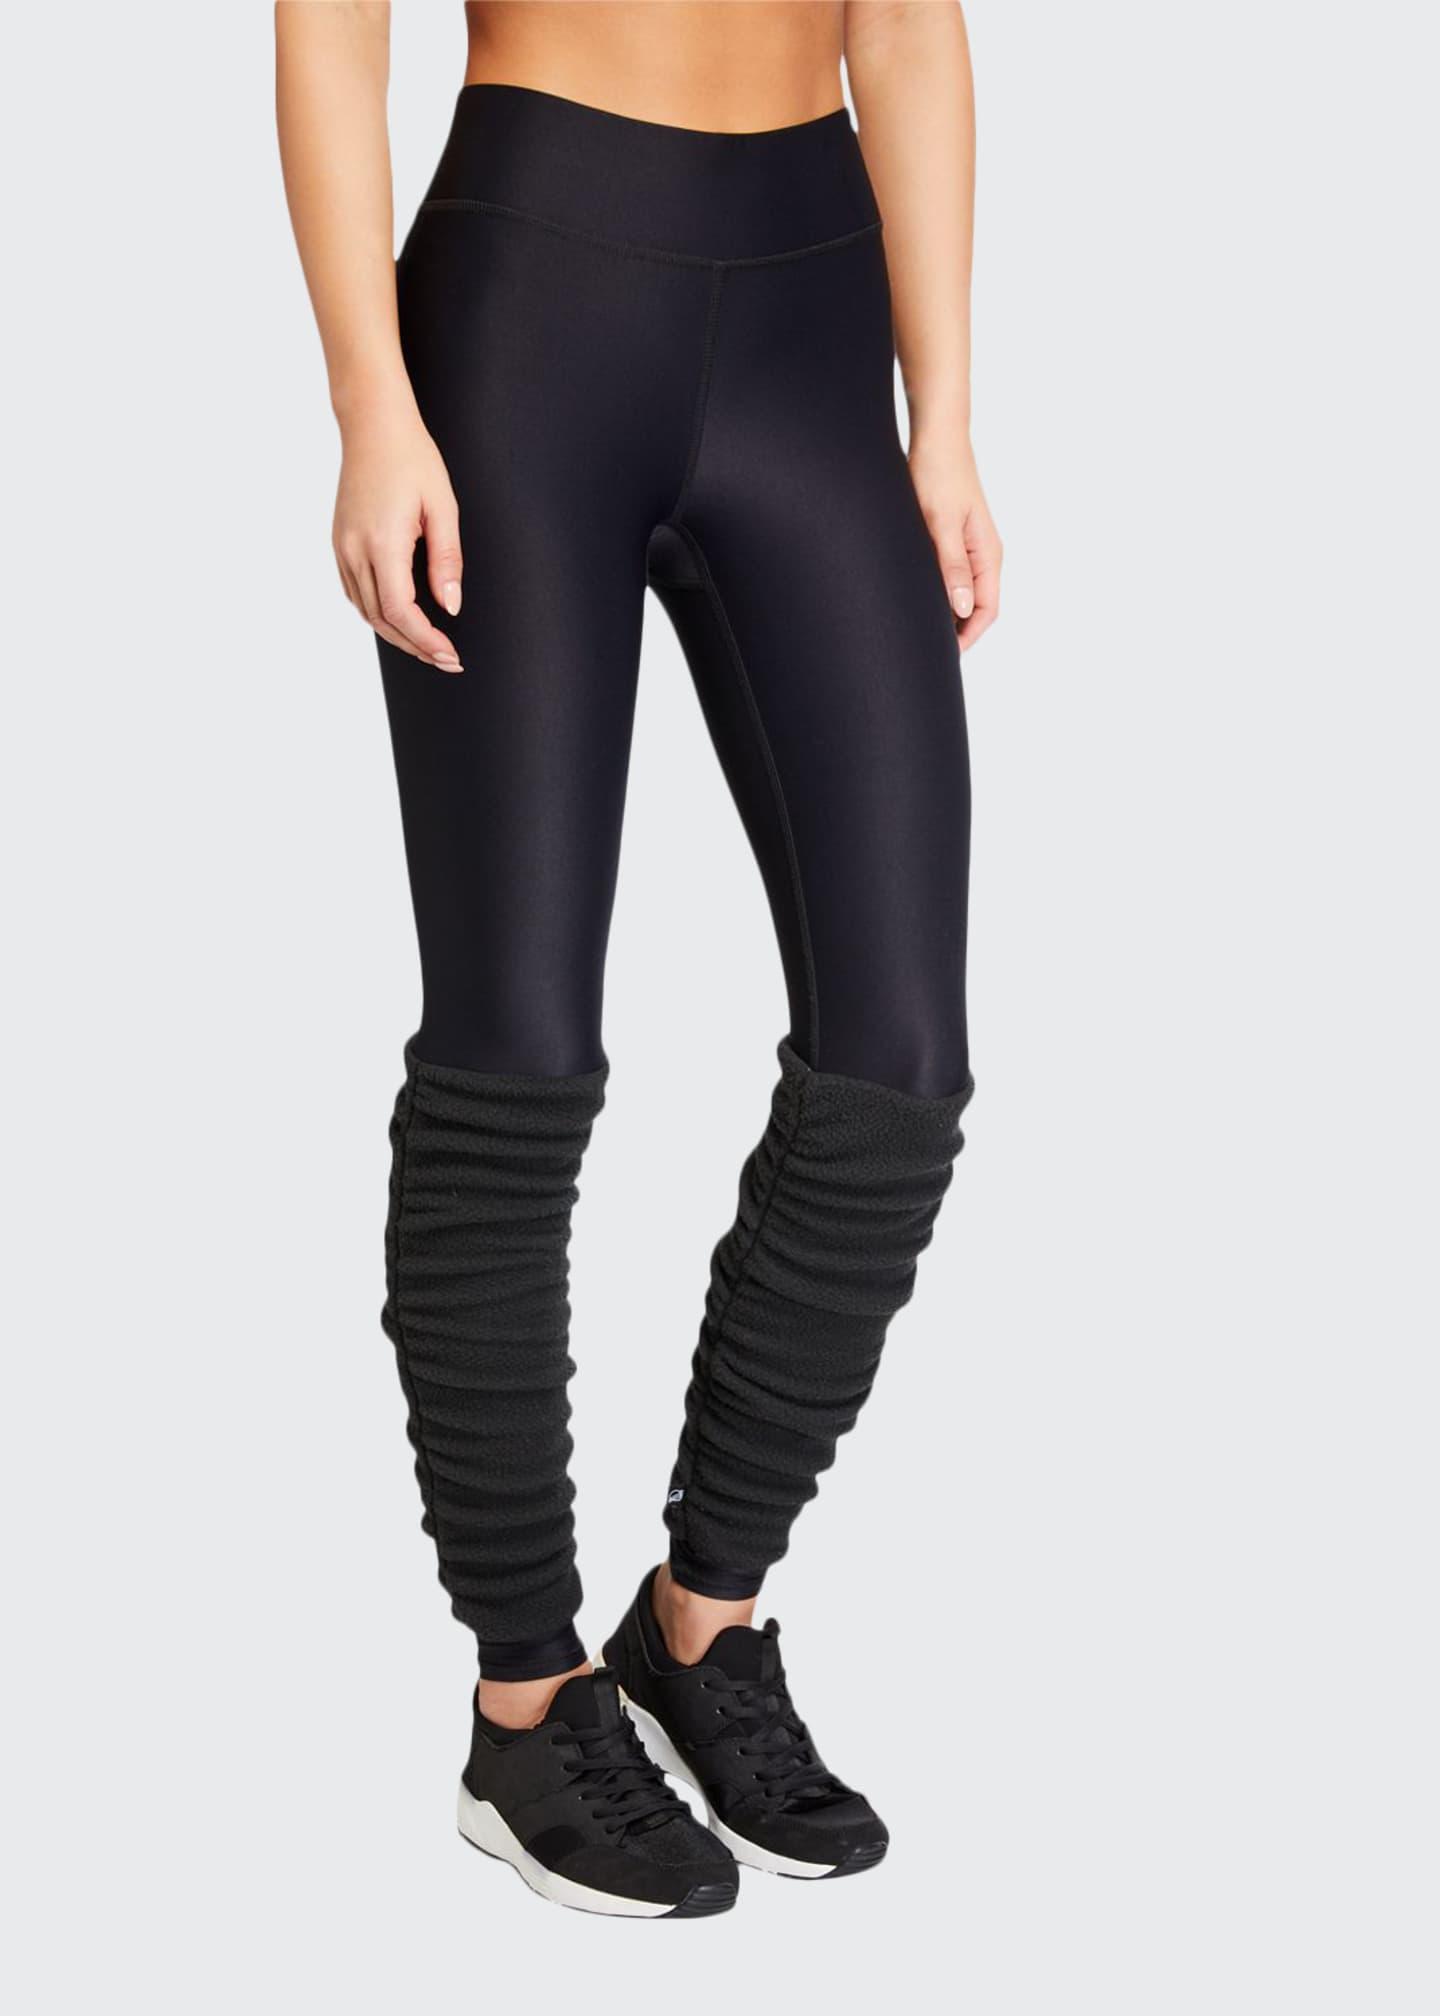 Terez American Dream Leggings w/ Leg Warmers